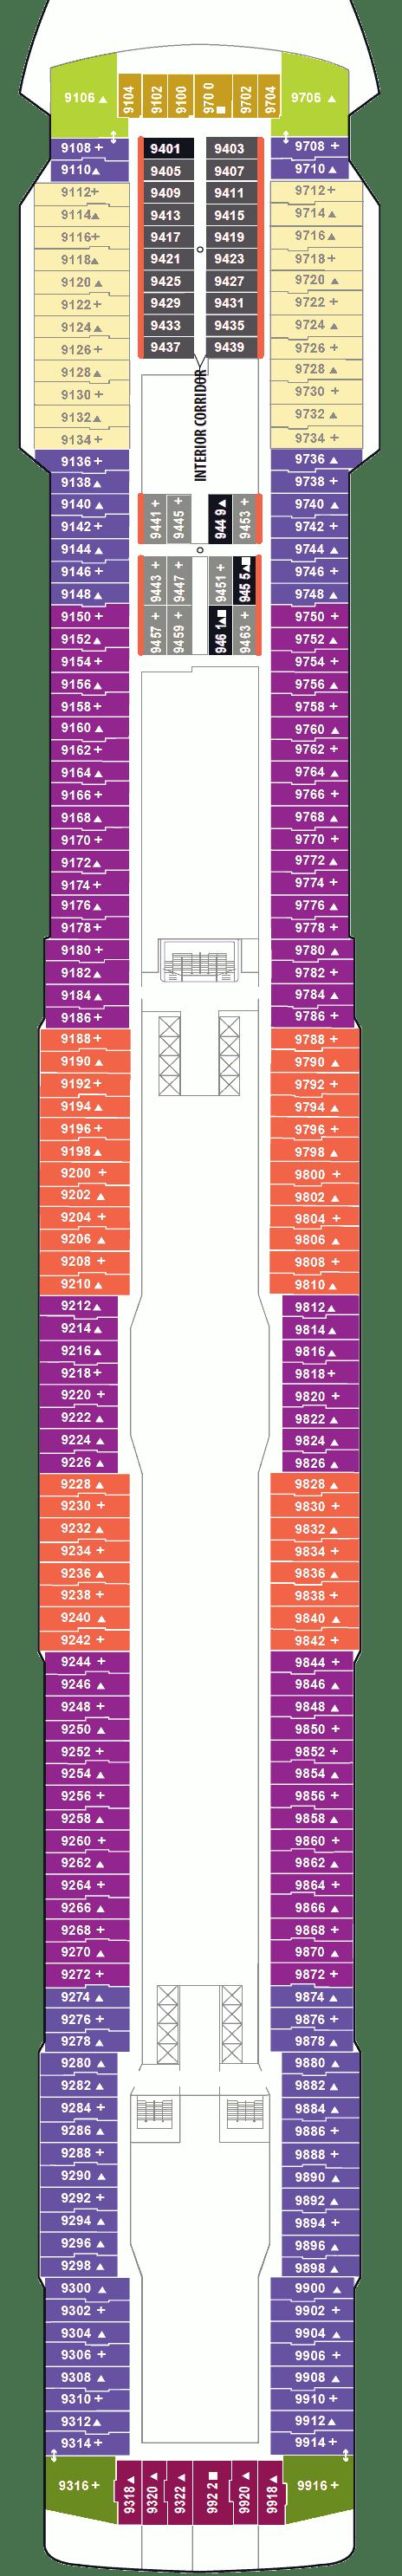 Deck Nine